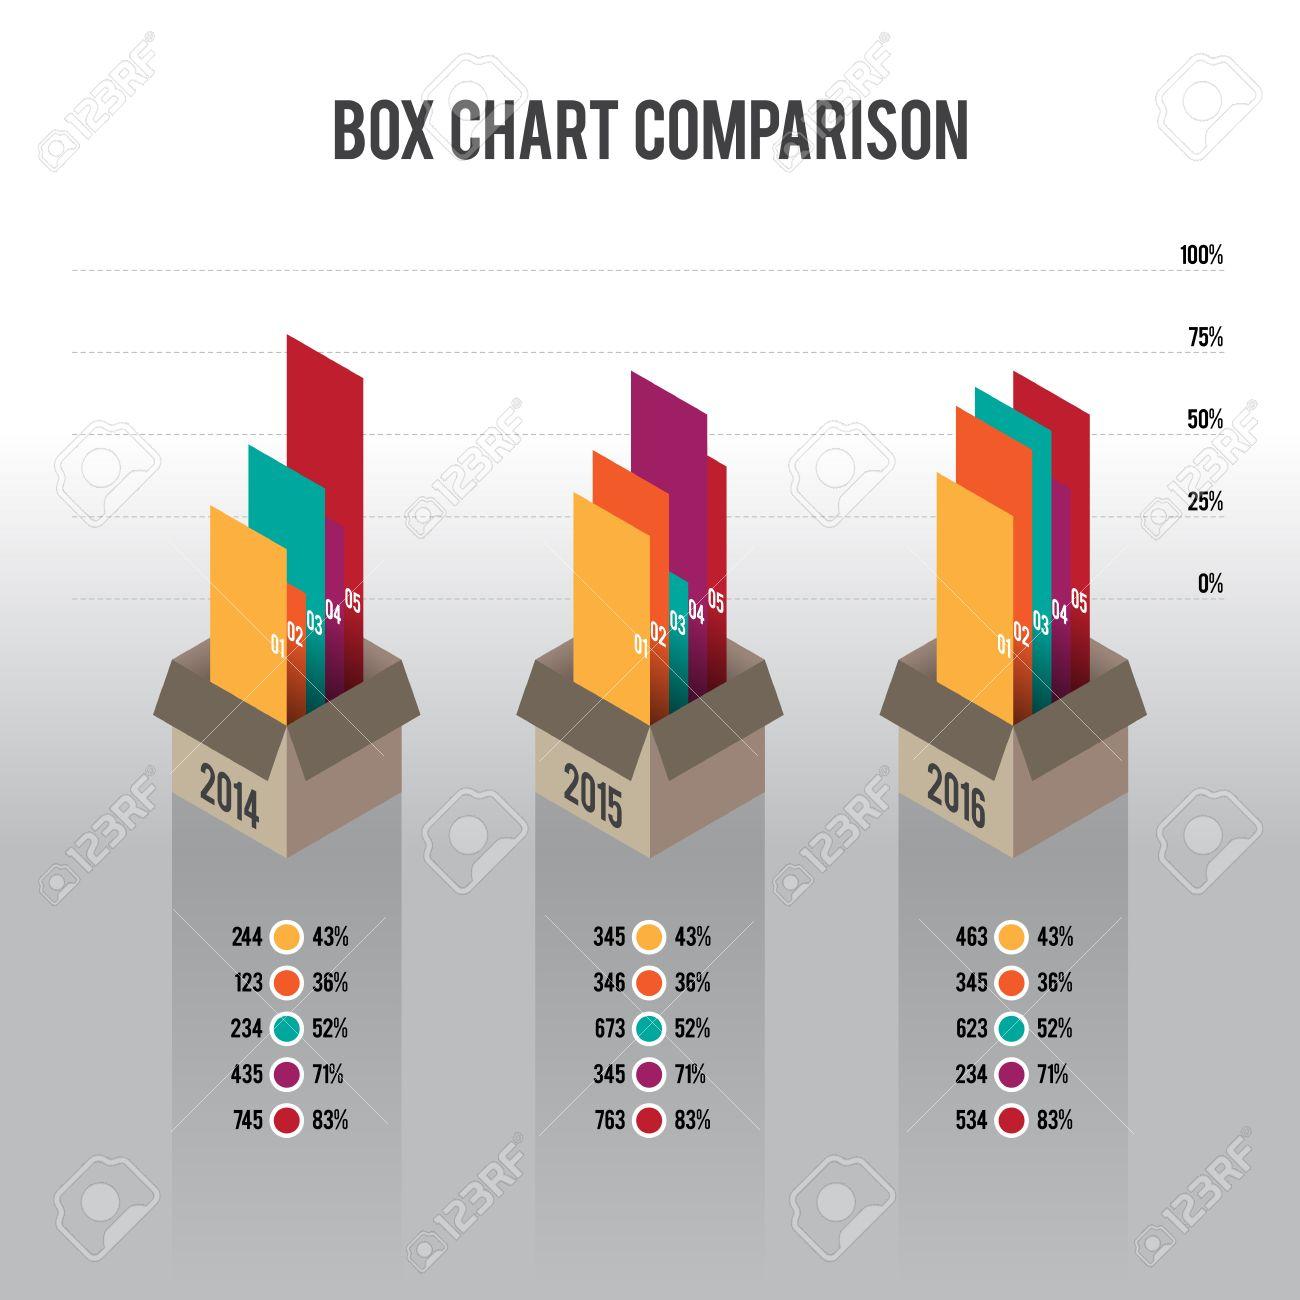 isometric illustration of box chart comparison infographic design element   stock vector - 59937863